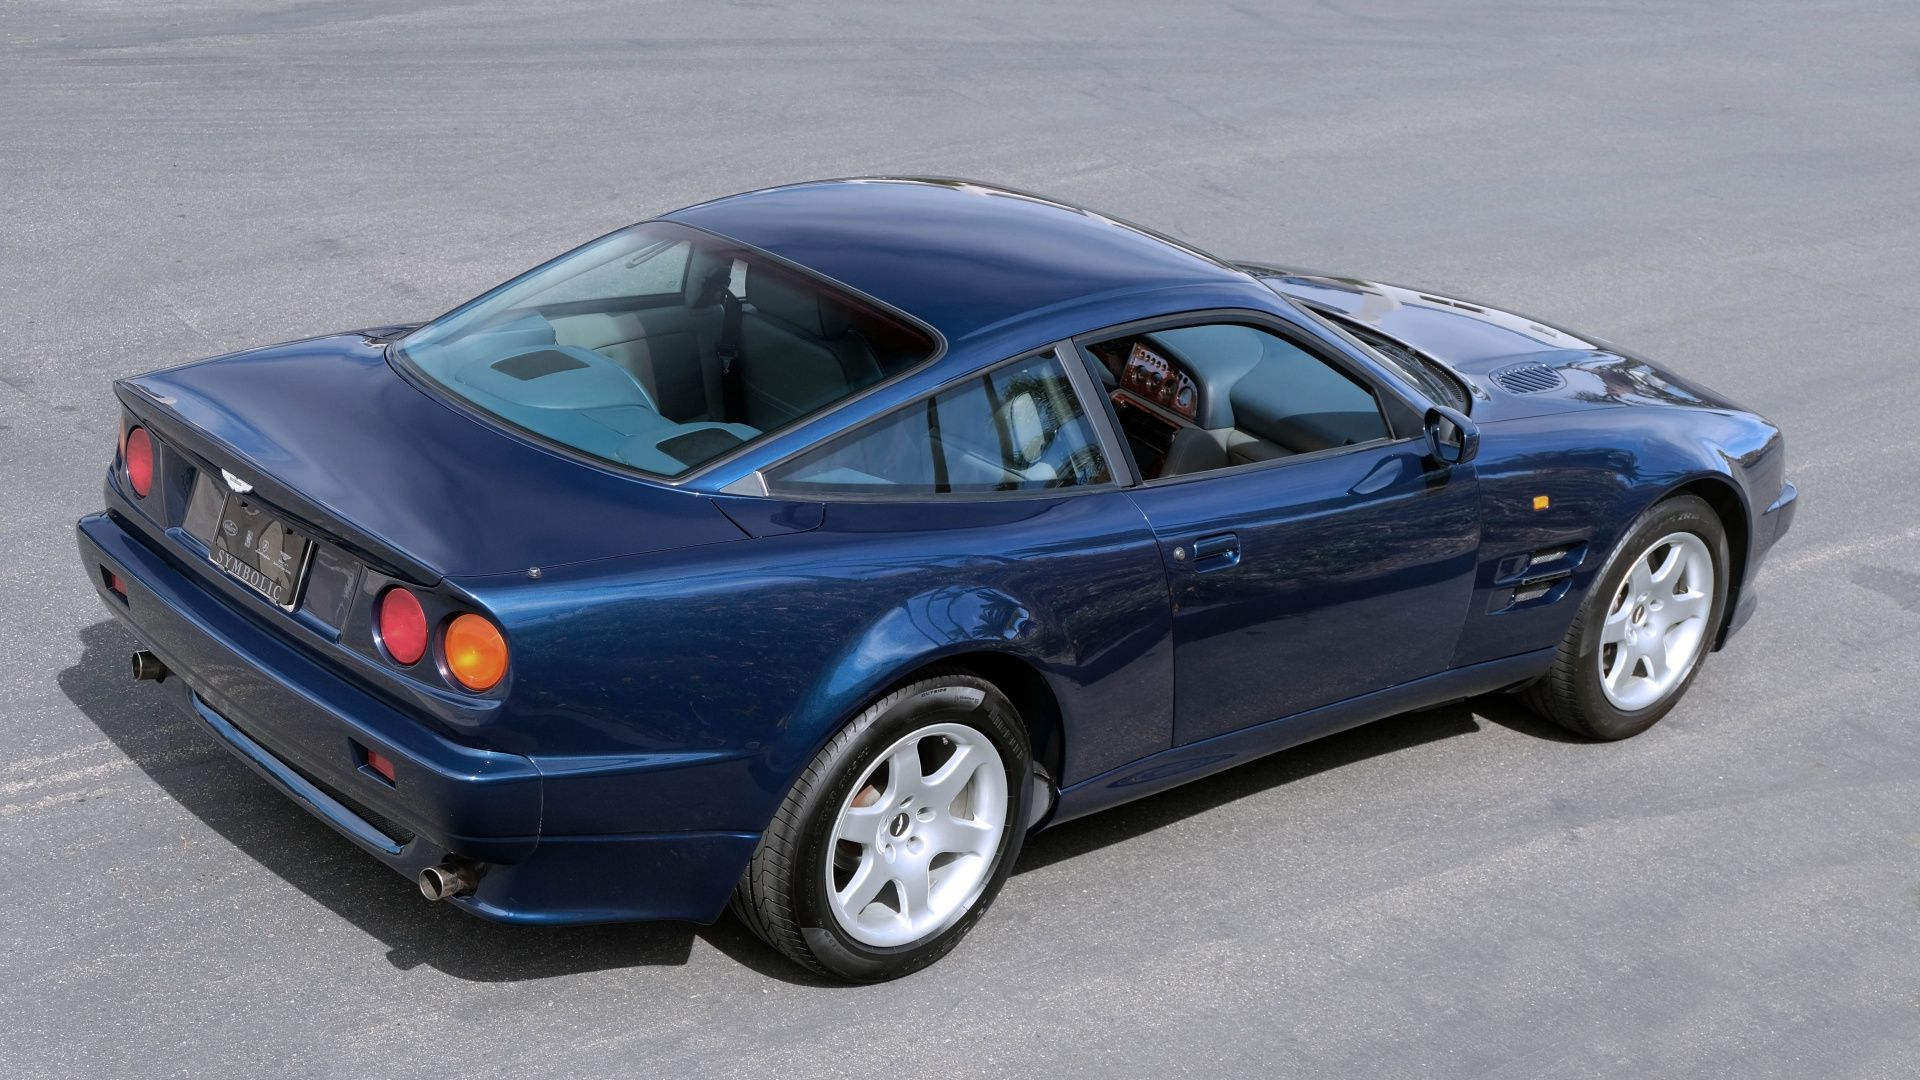 1996 Aston Martin V8 Coupe 12 of 101